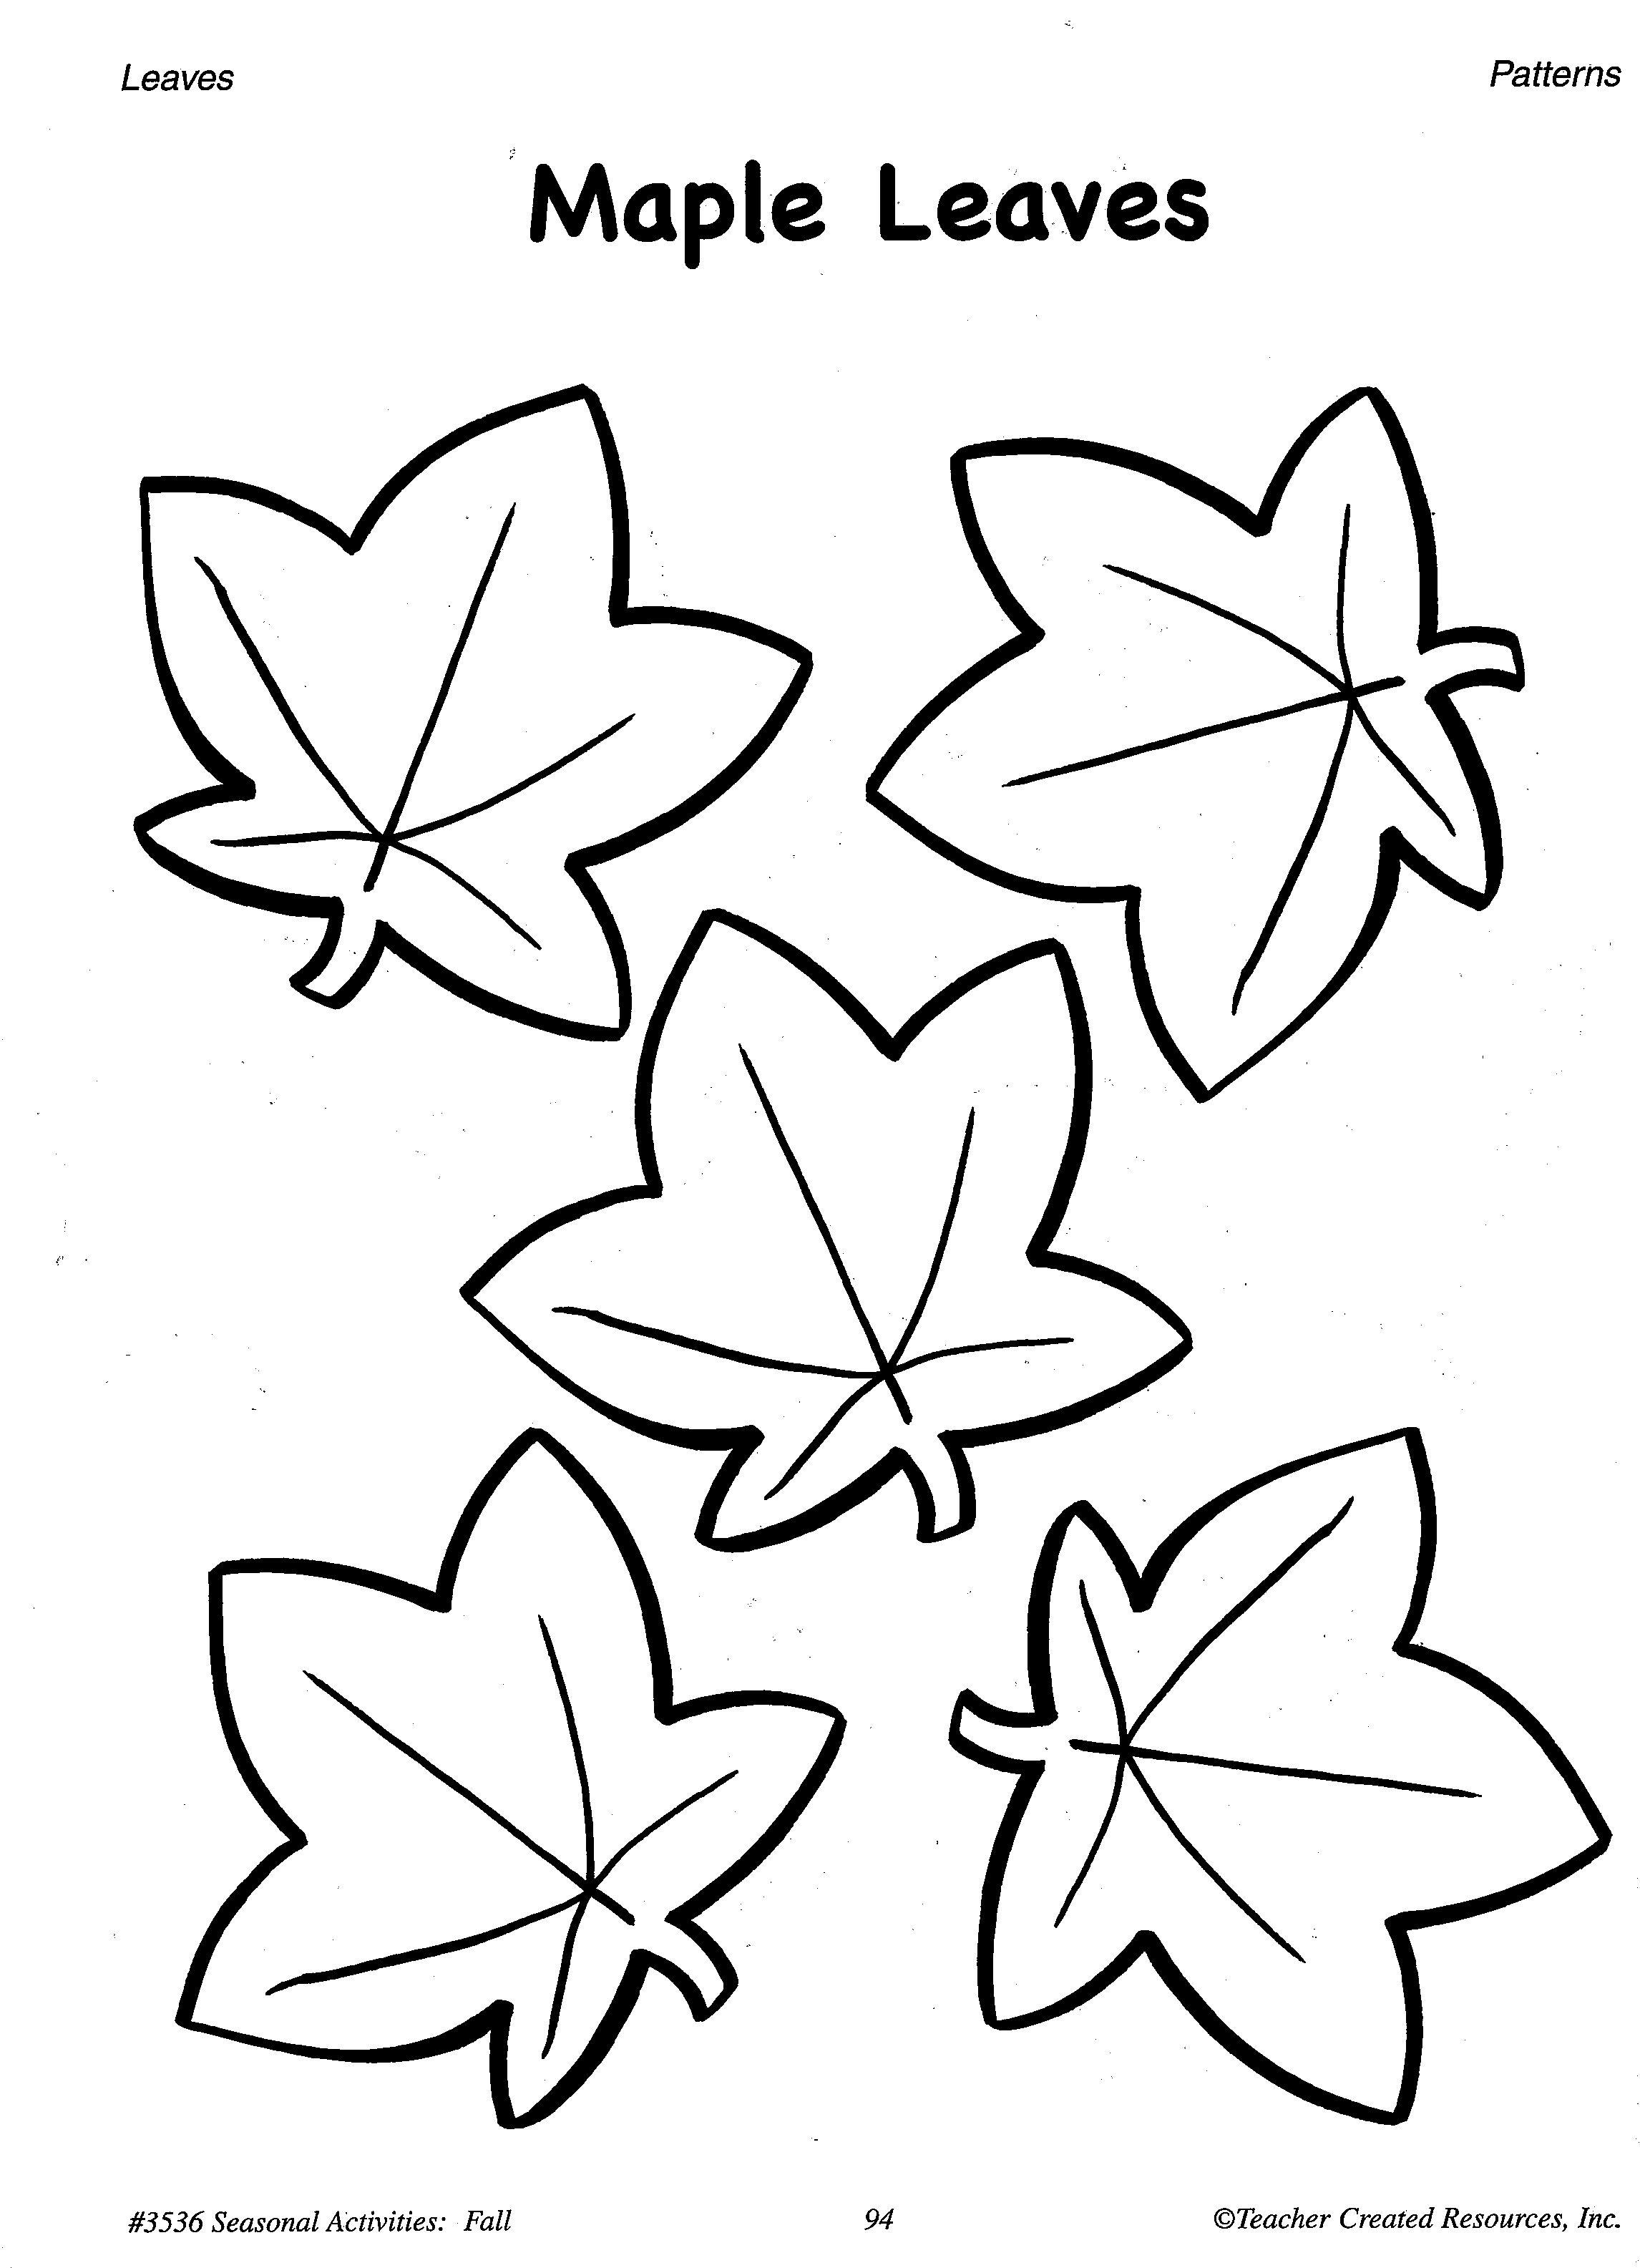 Traceable Leaf Patterns